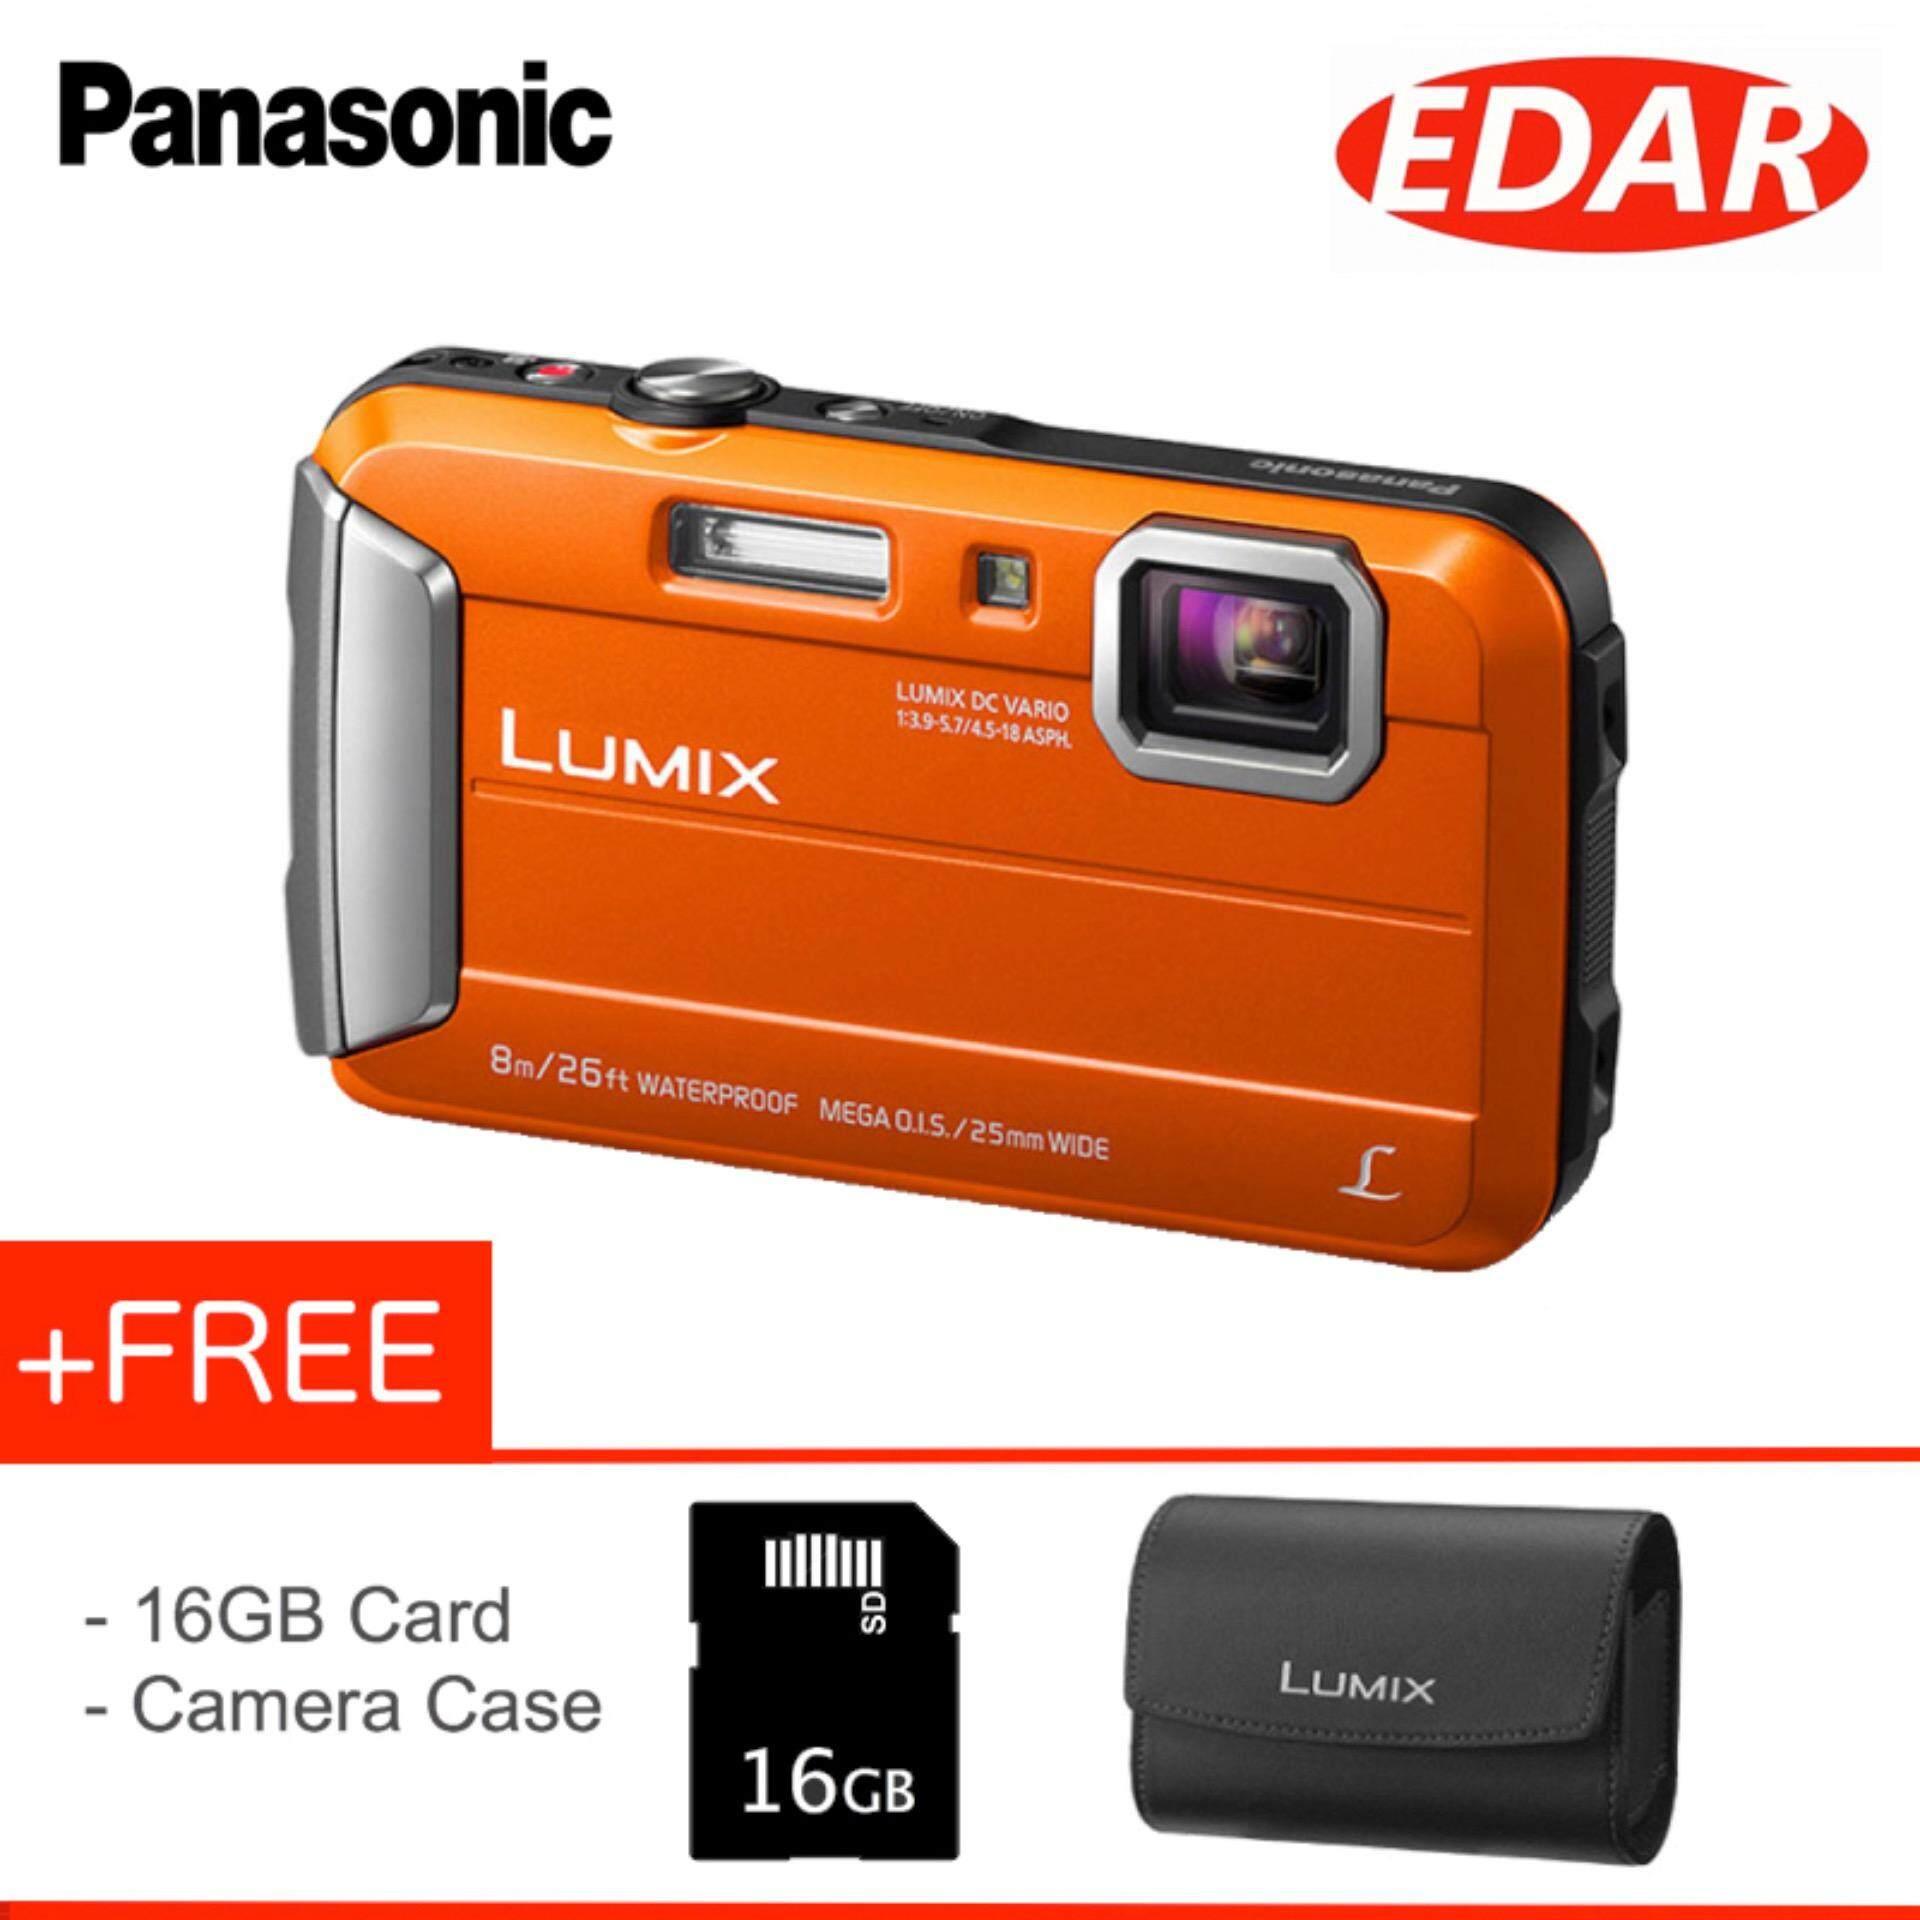 Panasonic Point Shoot Cameras Price In Malaysia Lumix Dmc Lx10 Digital Camera Black Dsc Ft30 16mp Waterpoof 161 Mp Orange